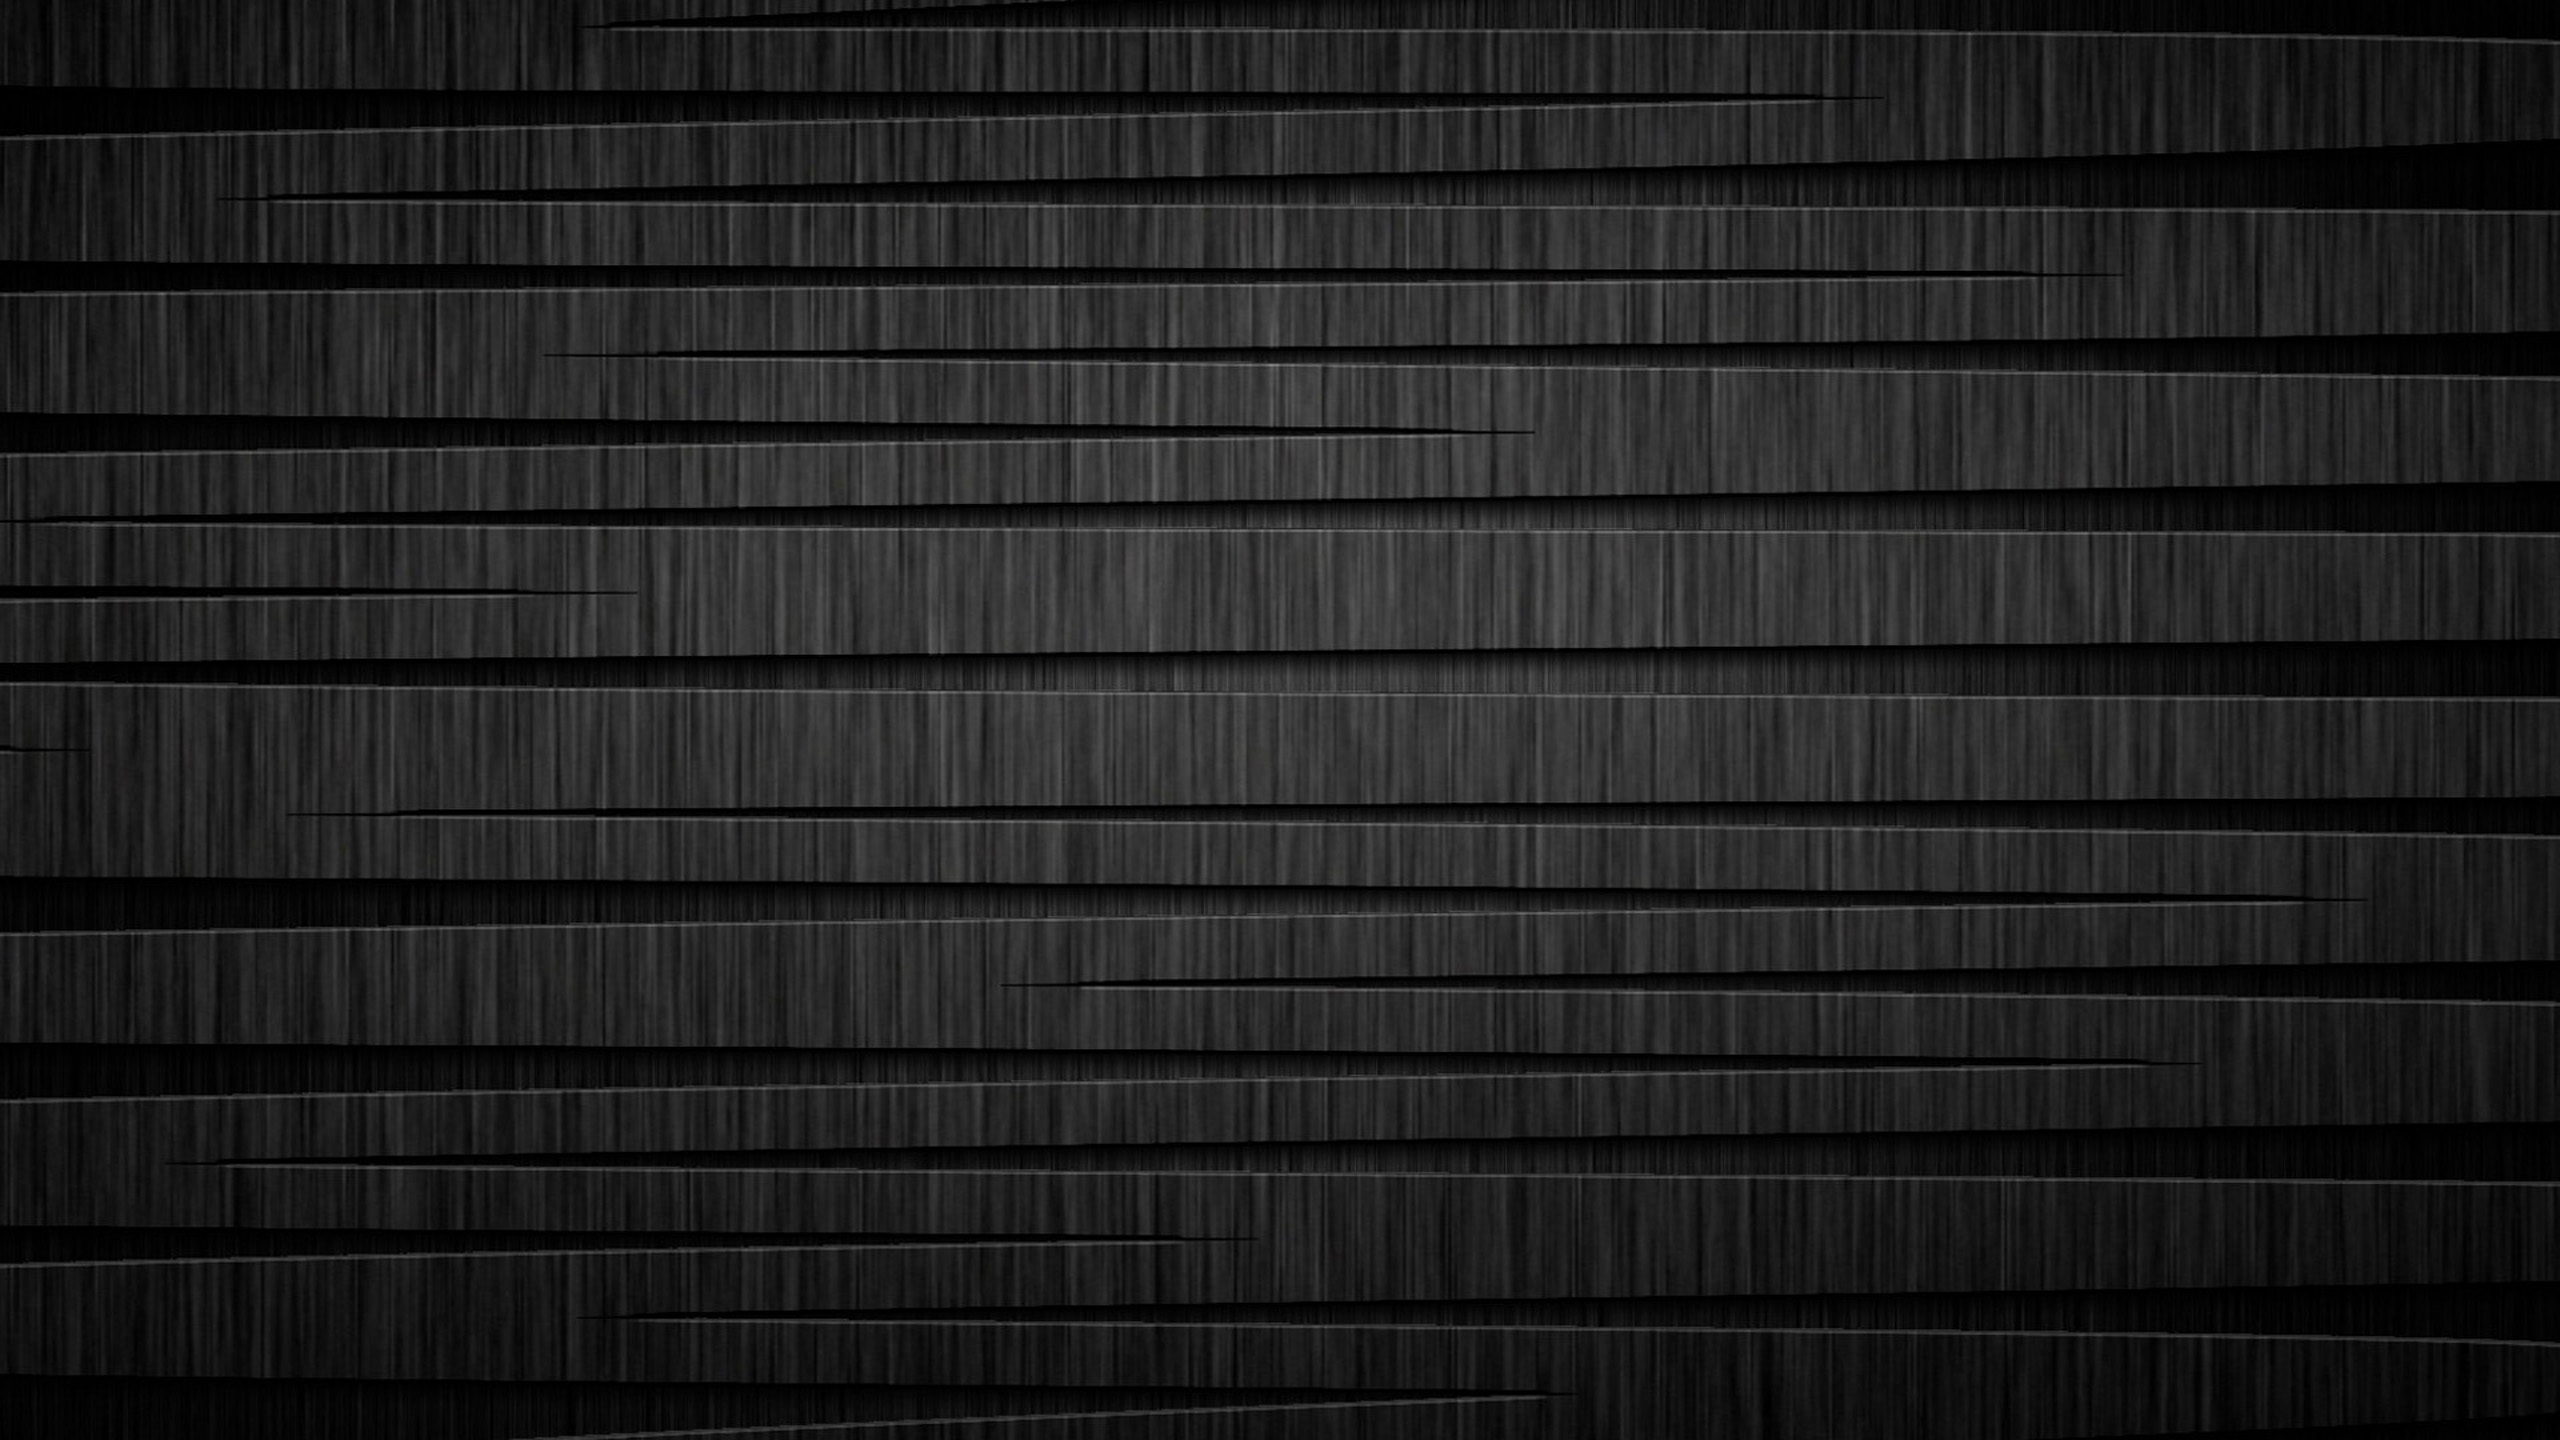 Wallpapers Wood Pattern  33 Wallpapers. Wallpapers Wood Pattern  33 Wallpapers    Adorable Wallpapers